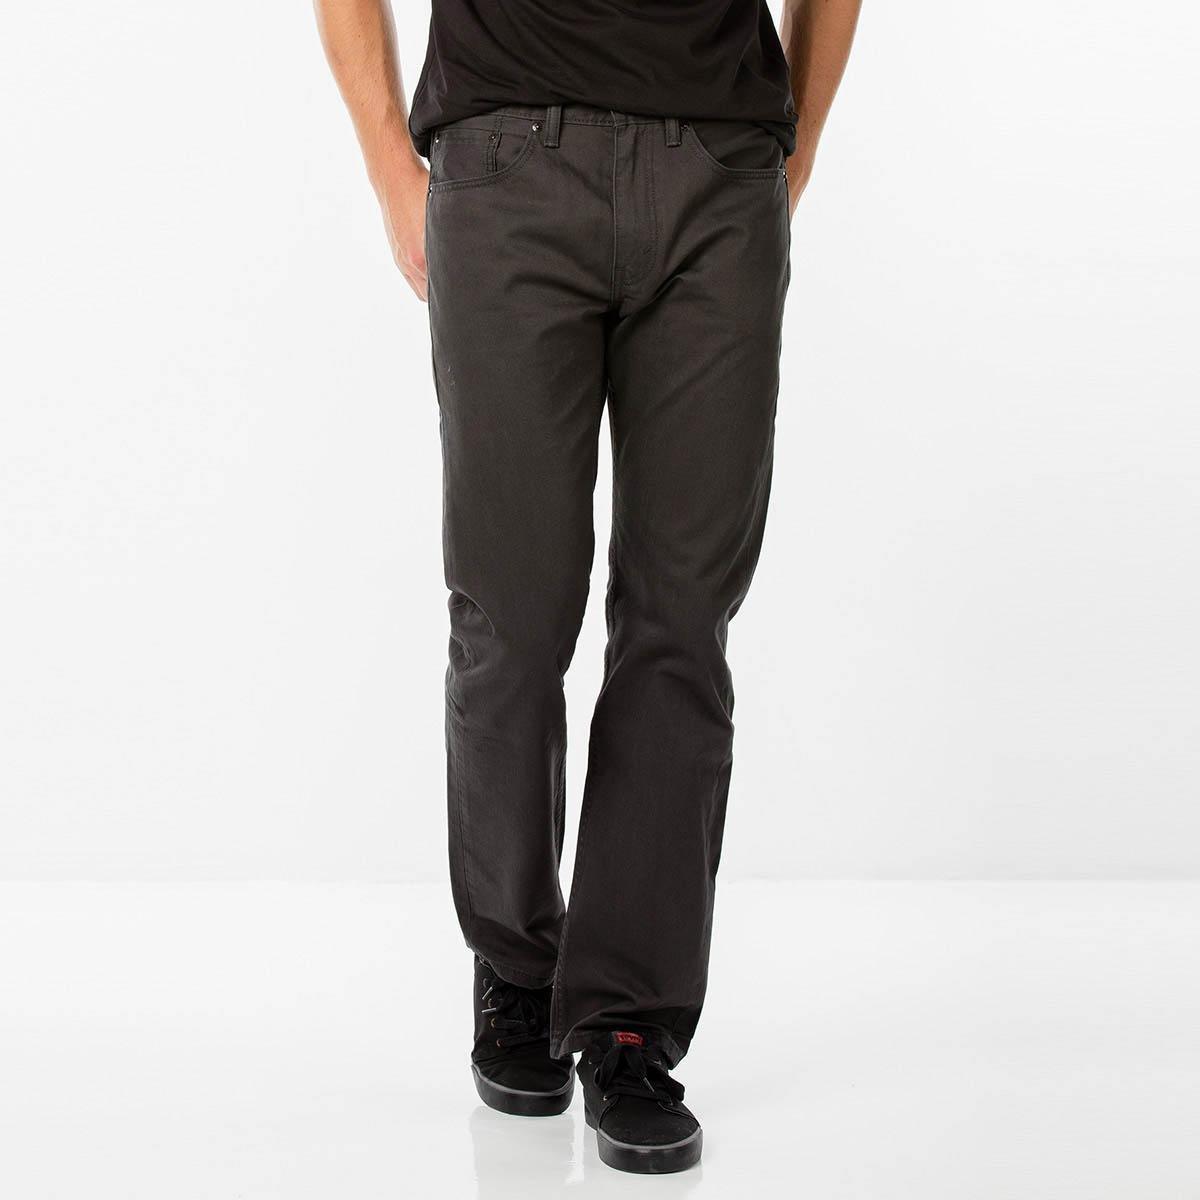 0cf22dca21745 Calça Jeans Levi s 505 Regular Masculina - Preto - Compre Agora ...